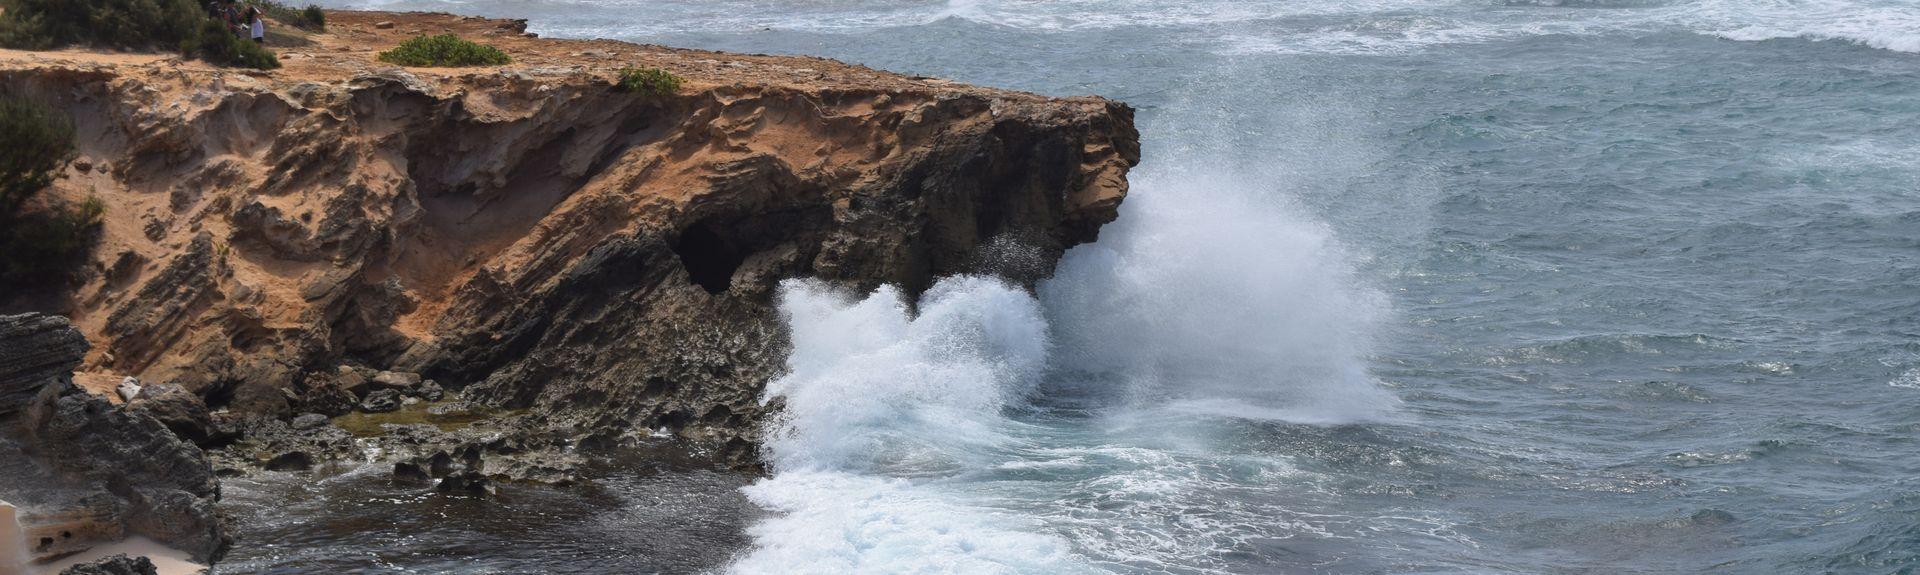 Lawai, Hawaii, United States of America